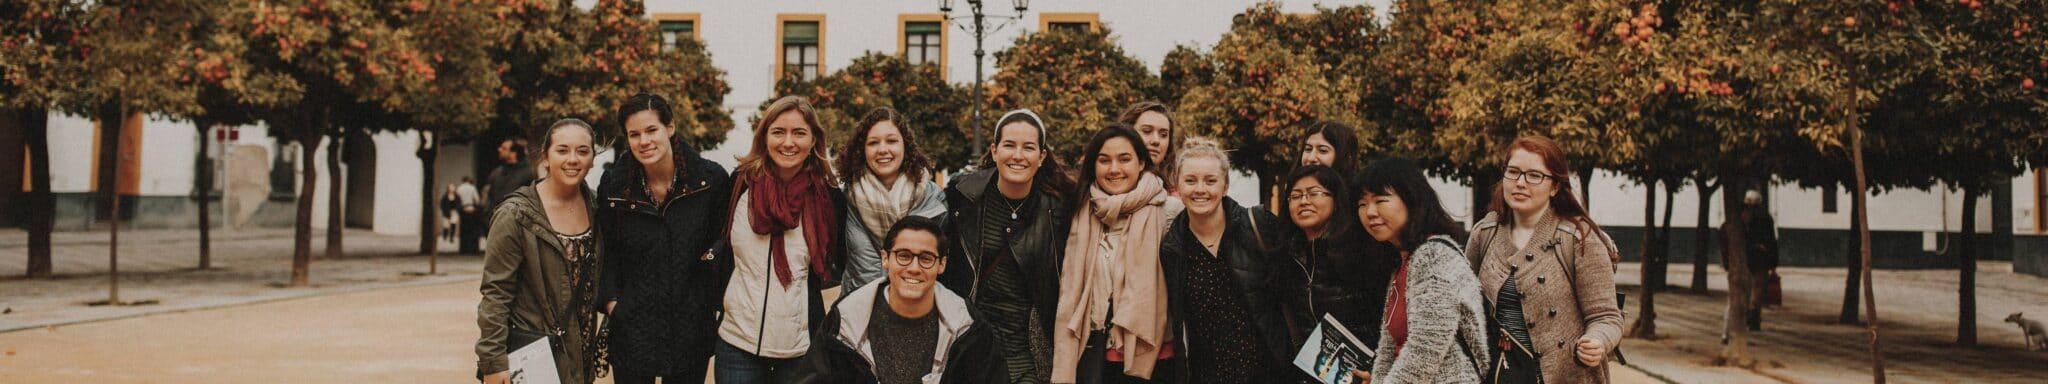 study Spanish abroad - University of Sevilla